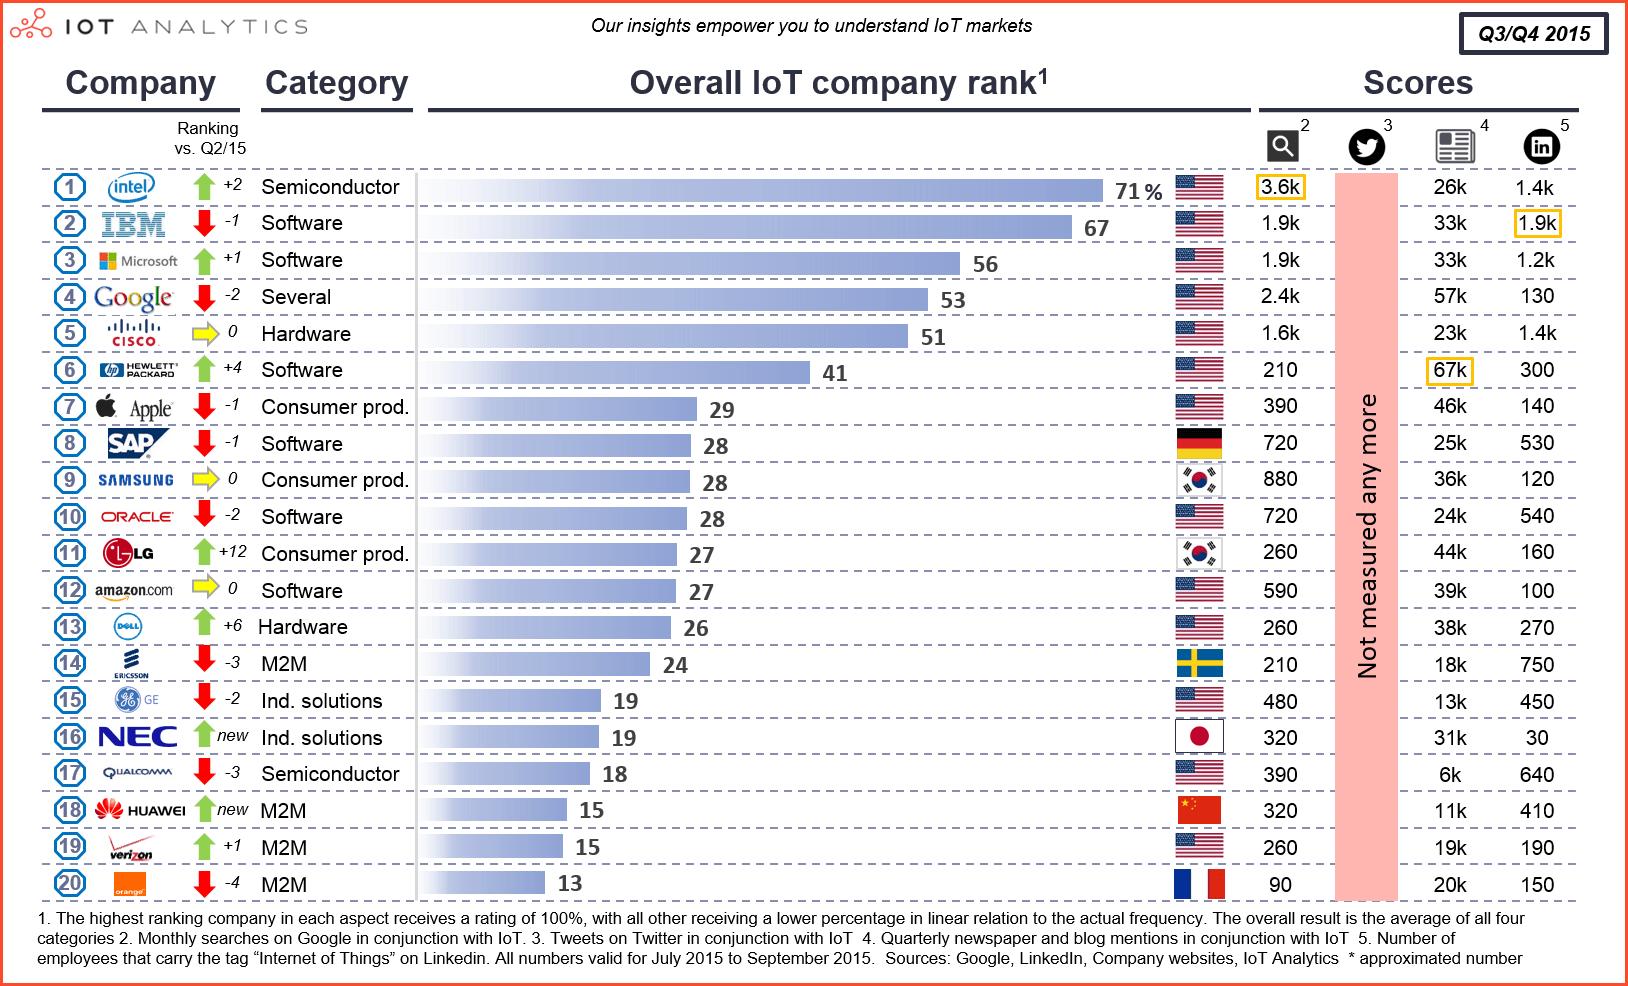 IoT-company-ranking-Q3-Q4-2015-Top-20-v3-min.png